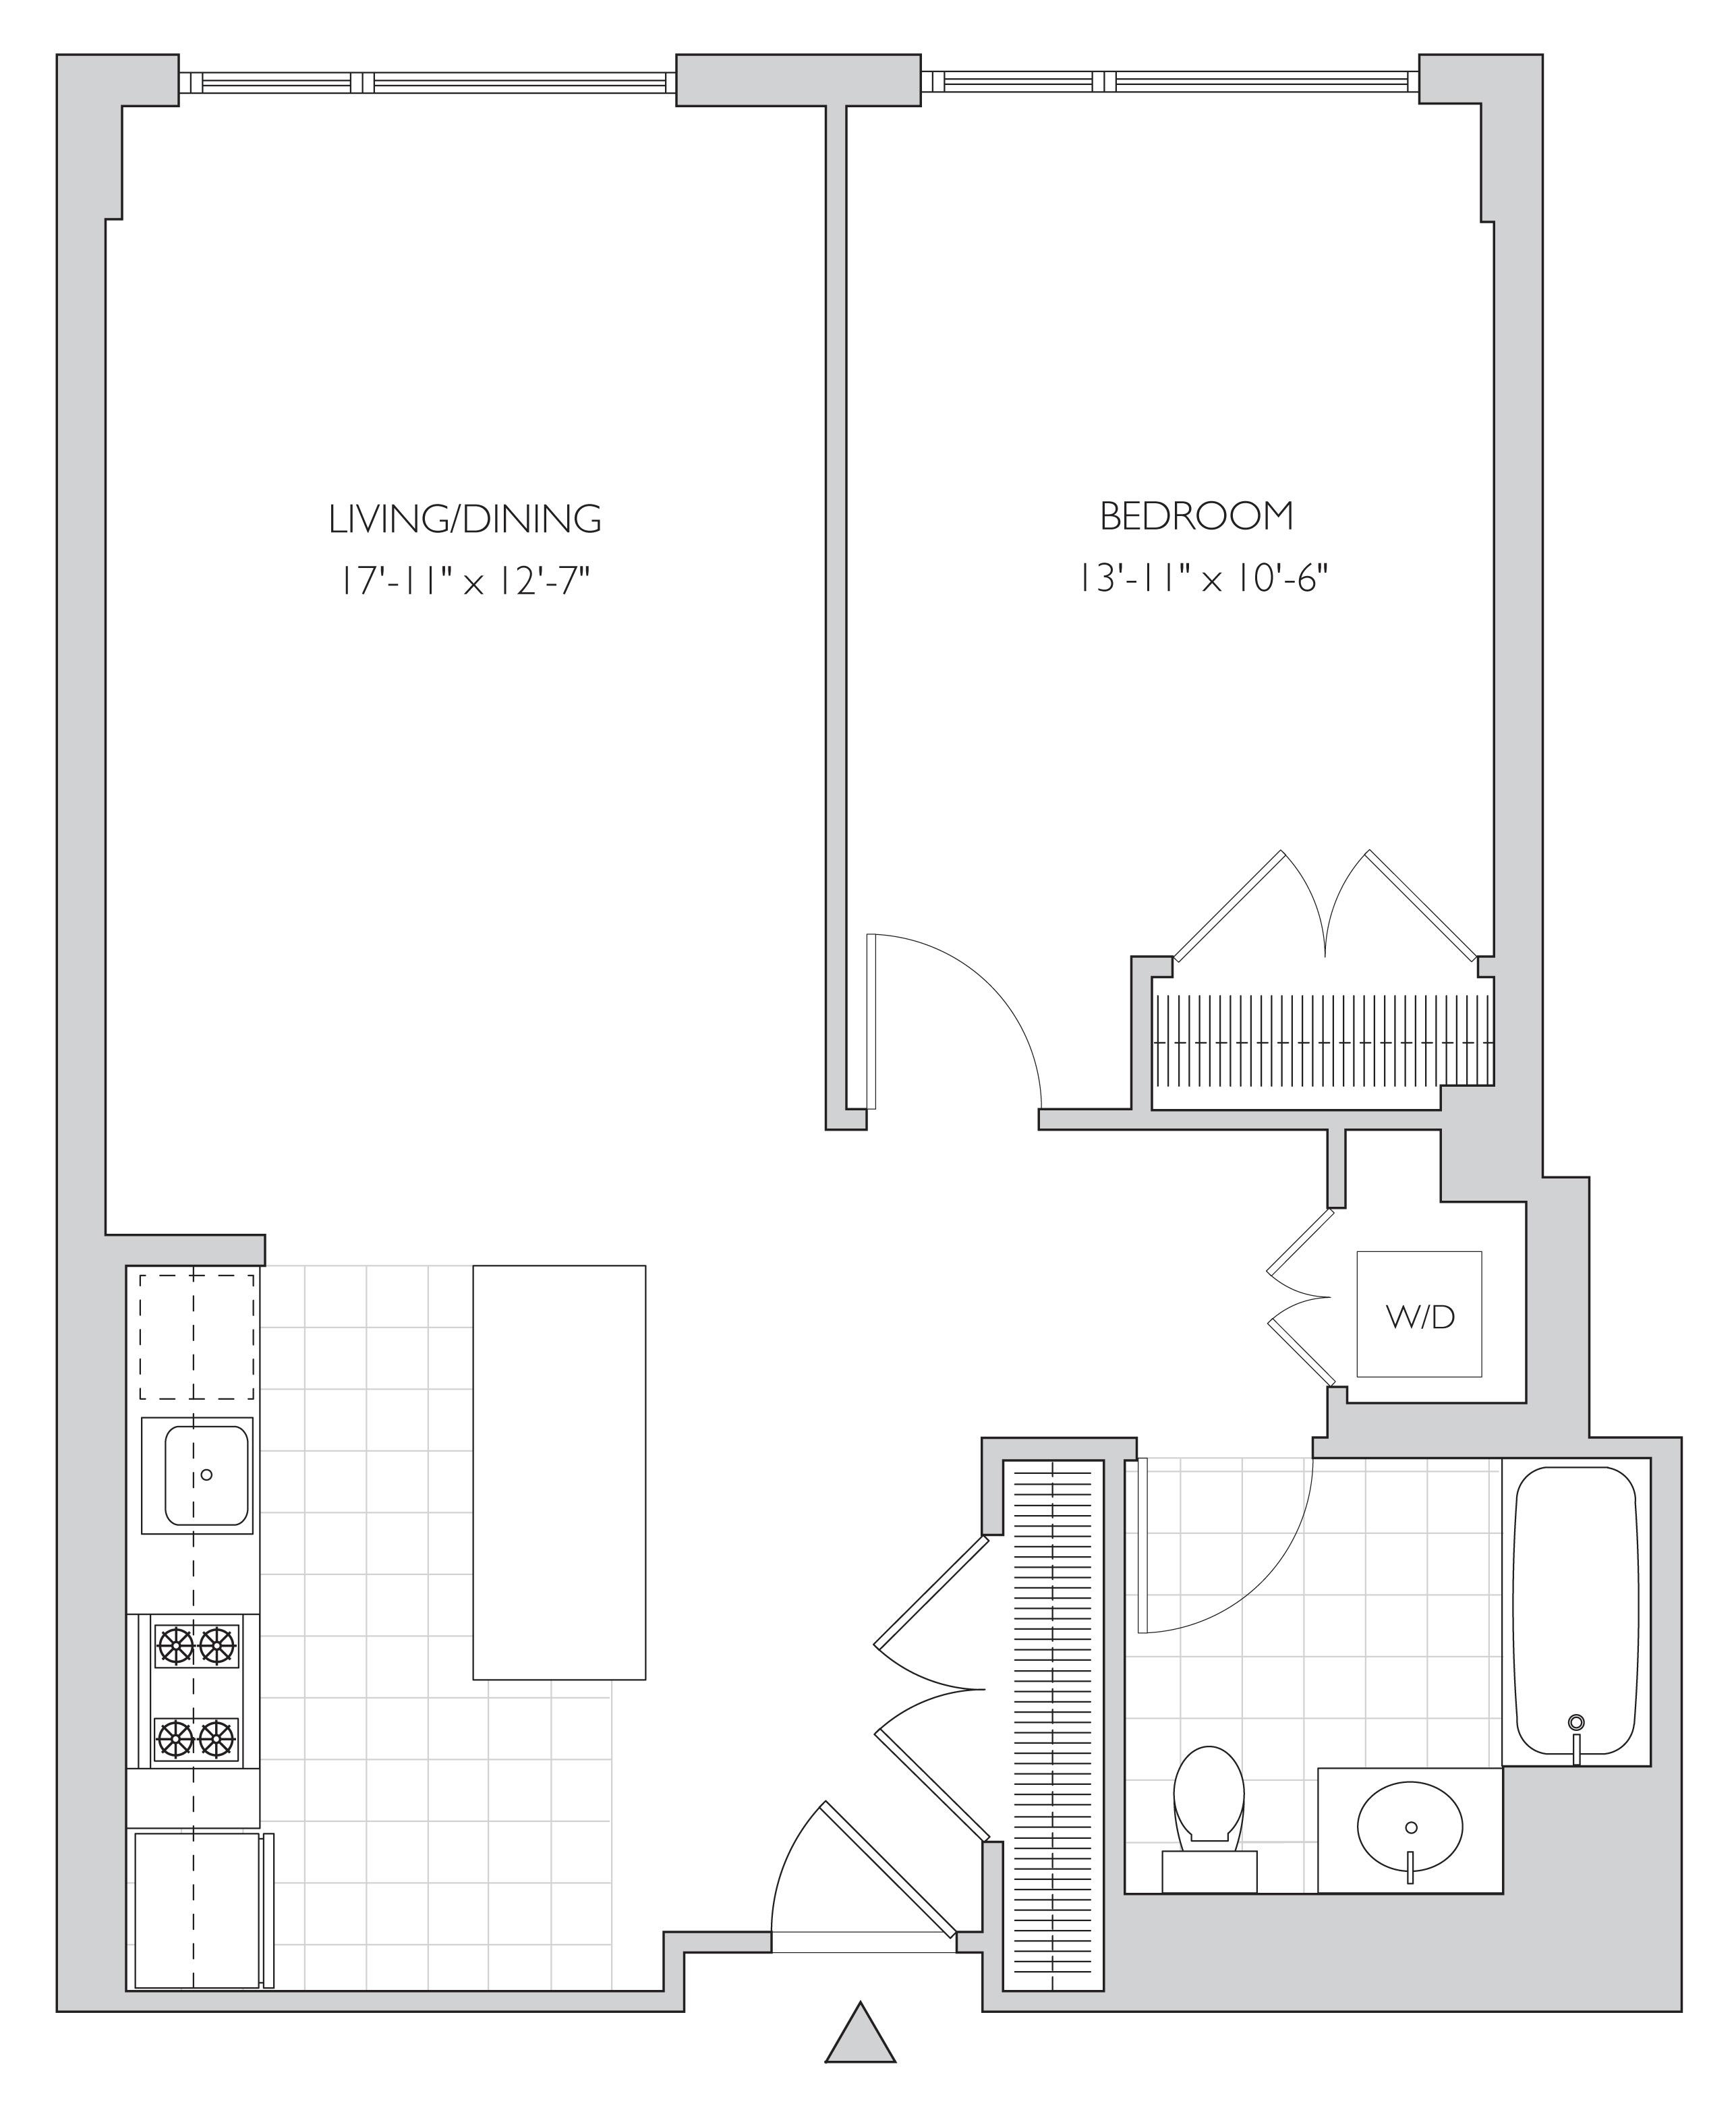 Small Kitchen Floor Plans 100 Restaurant Floor Plan Generator 100 Cool House Layouts The 585